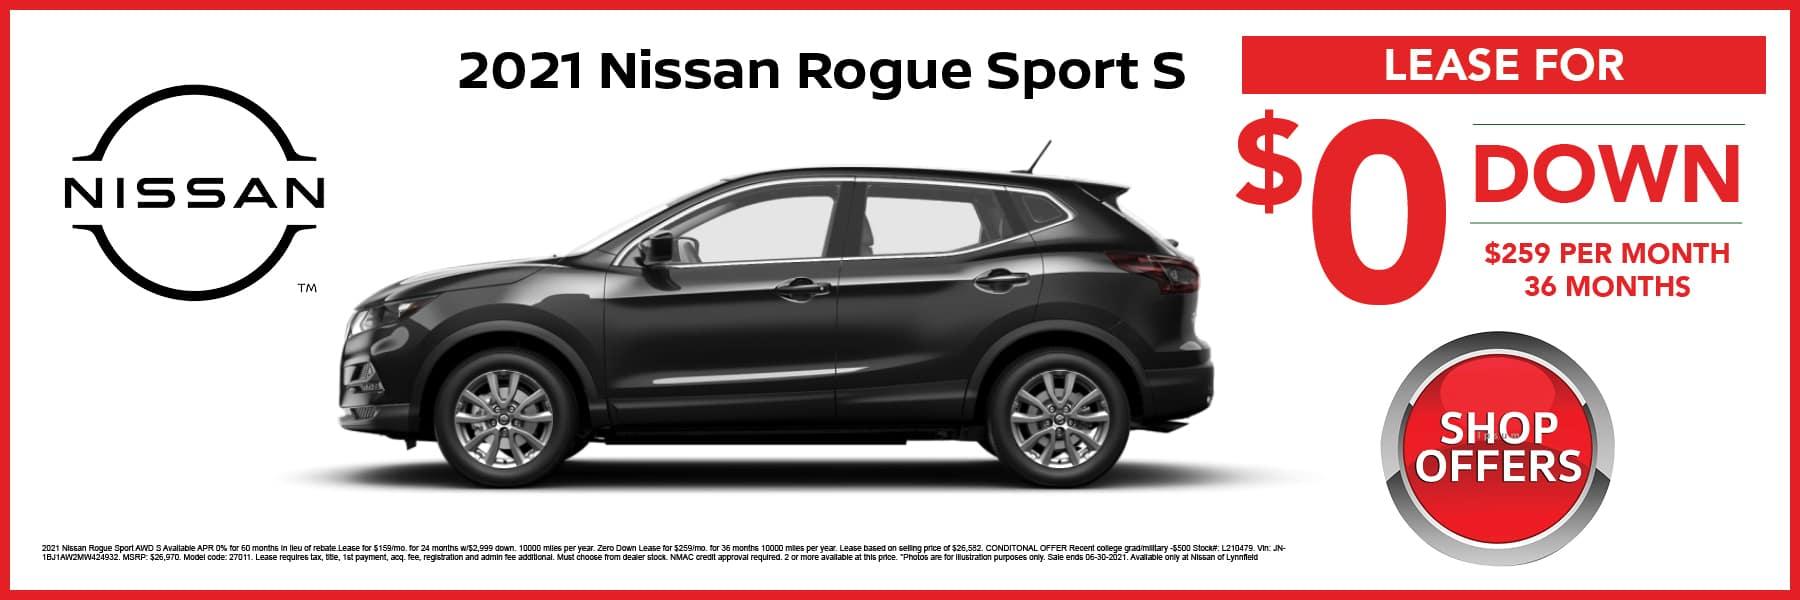 2021 Nissan Rogue Sport S in Black Lease Offer Web Slide